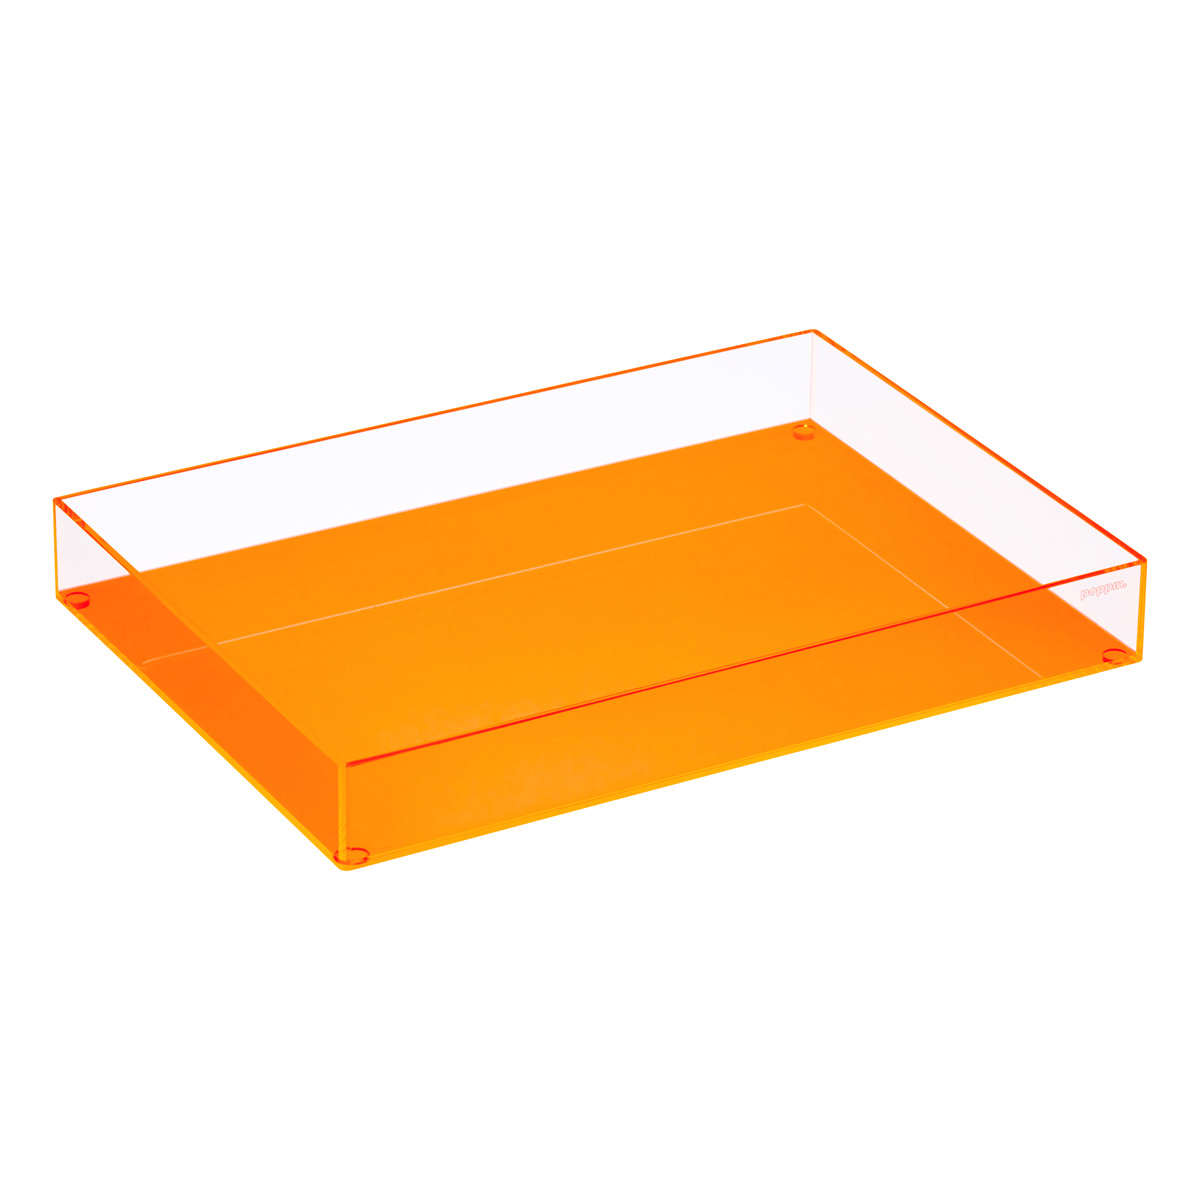 Acrylic Large Accessory Tray